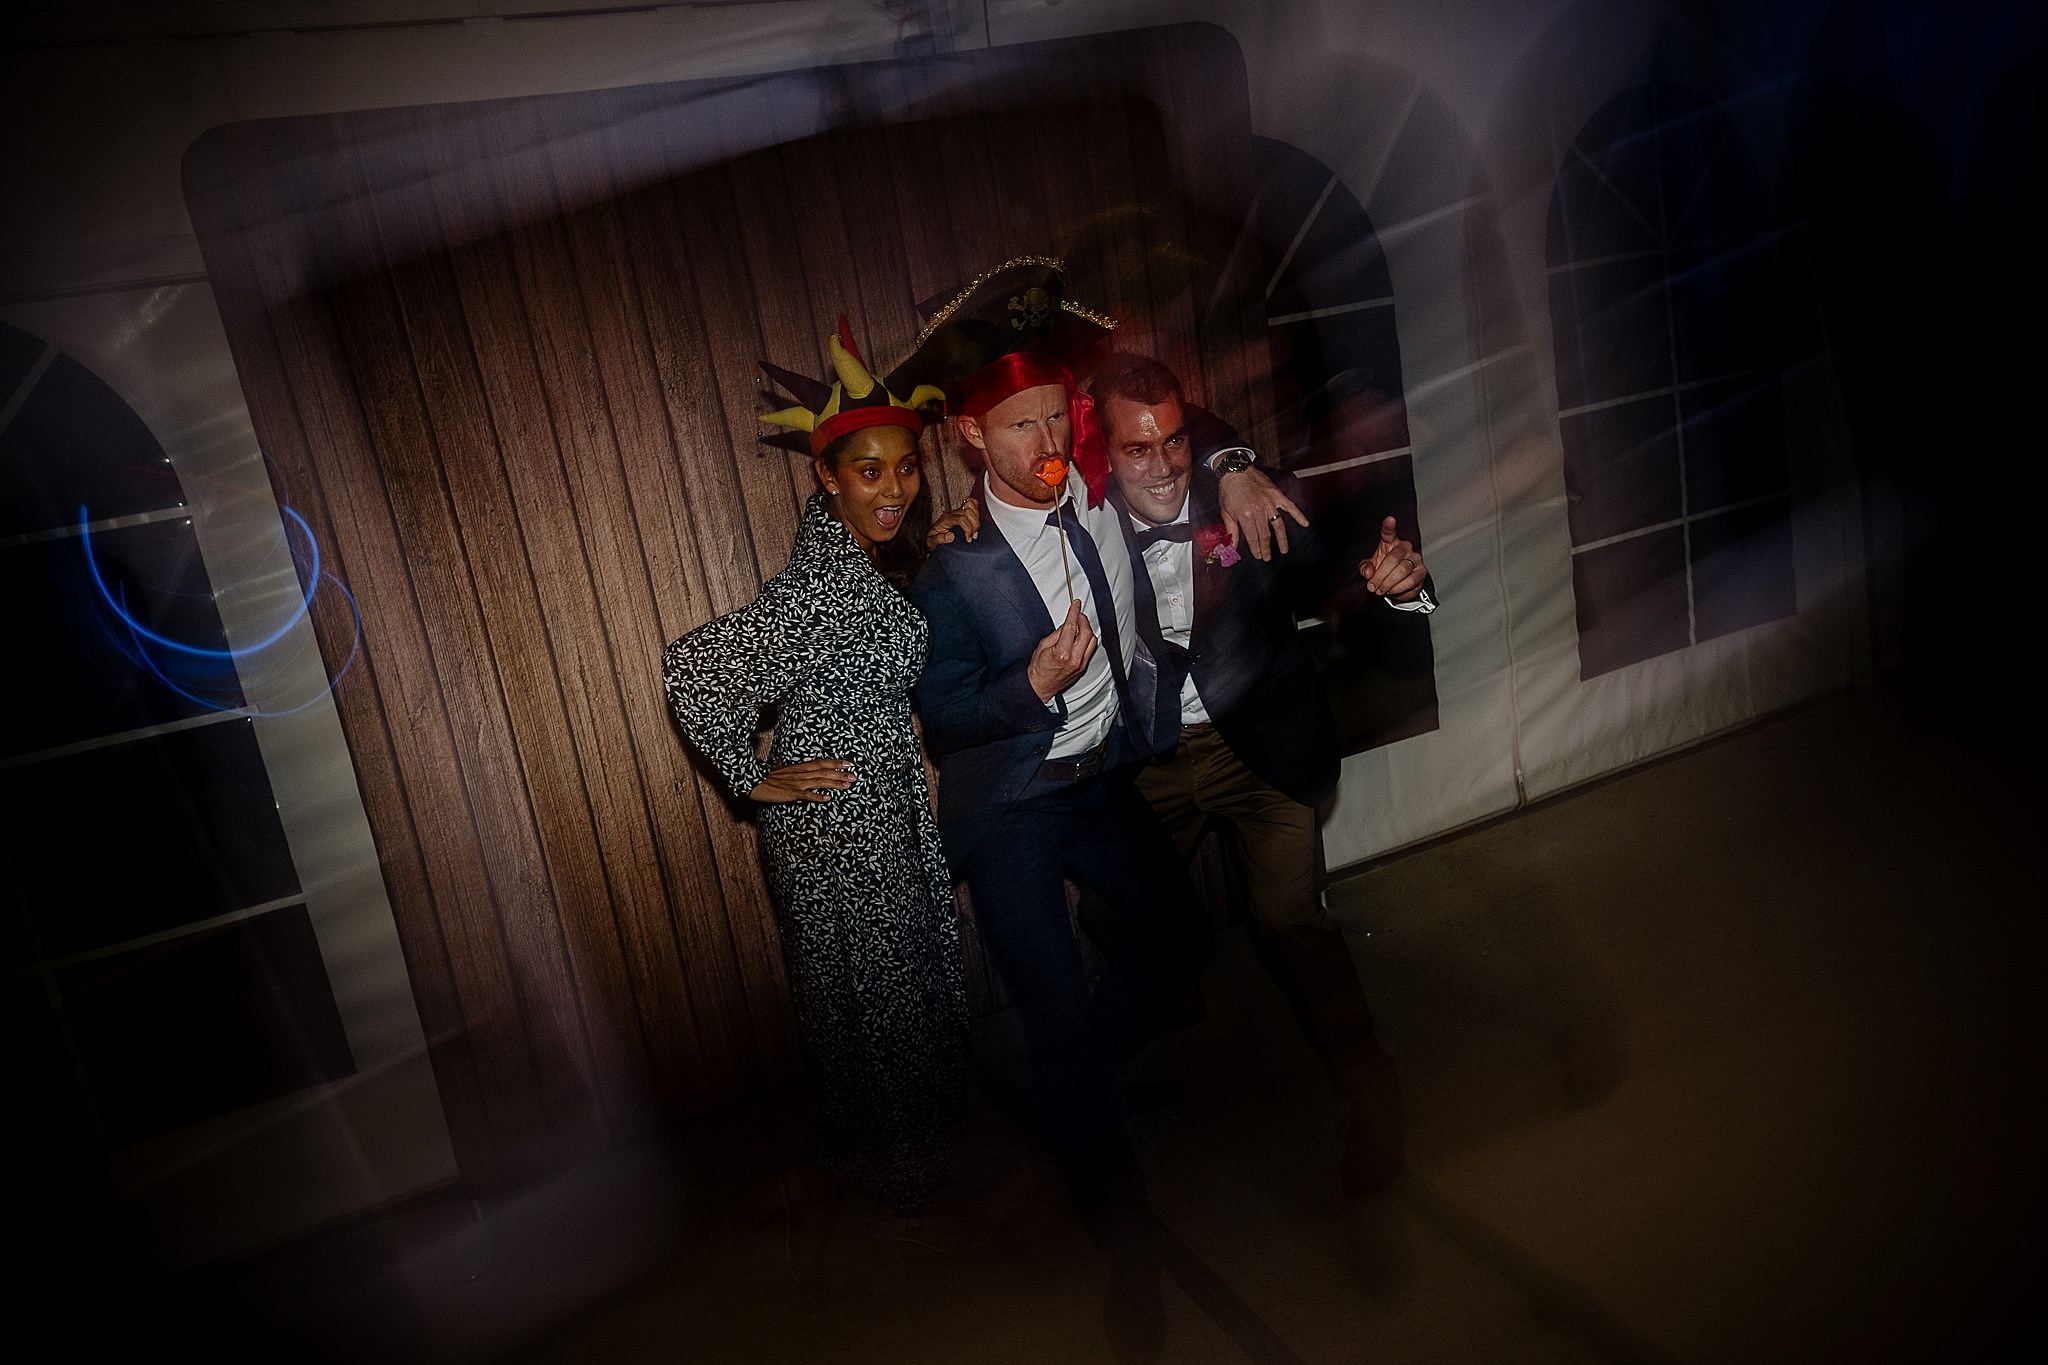 Barton flower bar,canberra florist,Canberra Photography,country wedding,Keepsakephoto by the Keeffes,ACT wedding photographer,ACT weddings,Canberra Wedding Photography,Canberra Wedding Photographer,canberra wedding,destination wedding,Poachers pantry,Poachers Pantry wedding,Wedding Inspiration,